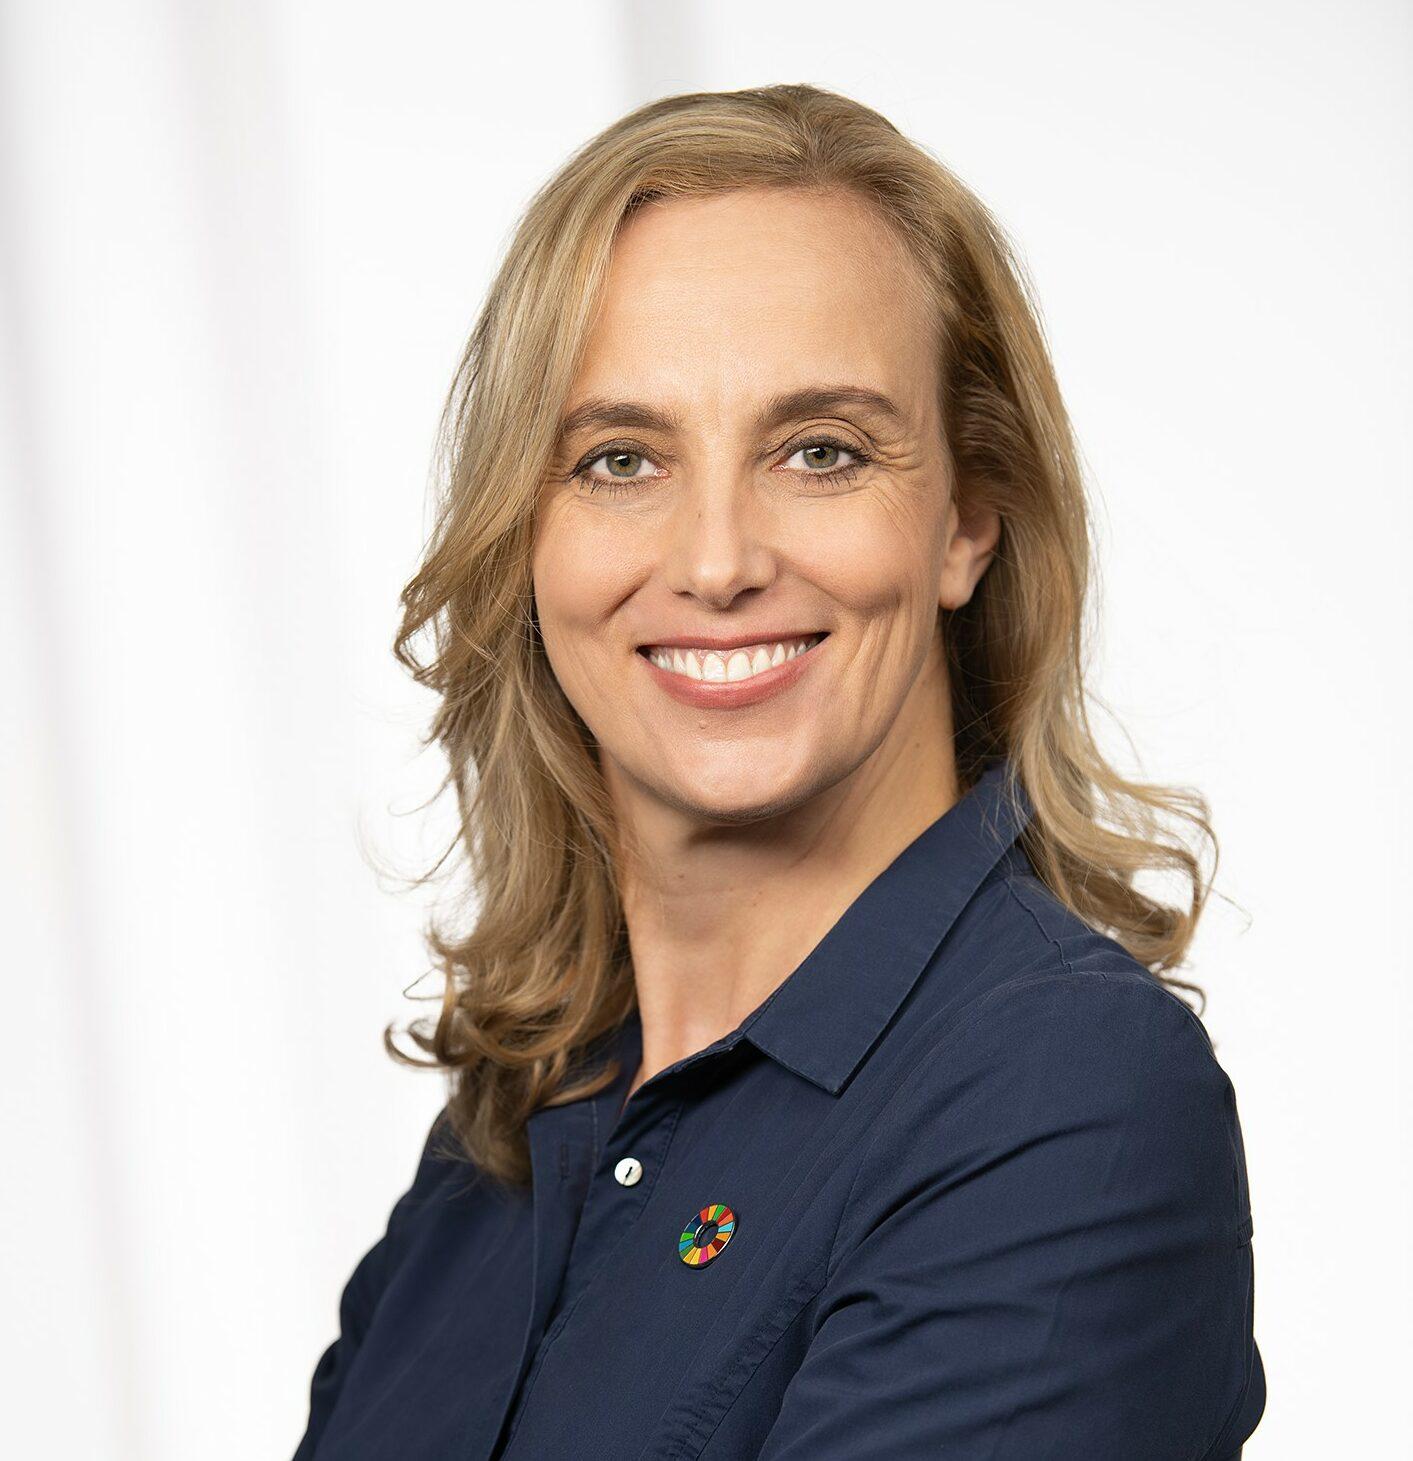 Mag.a Daniela Knieling, Network Representative